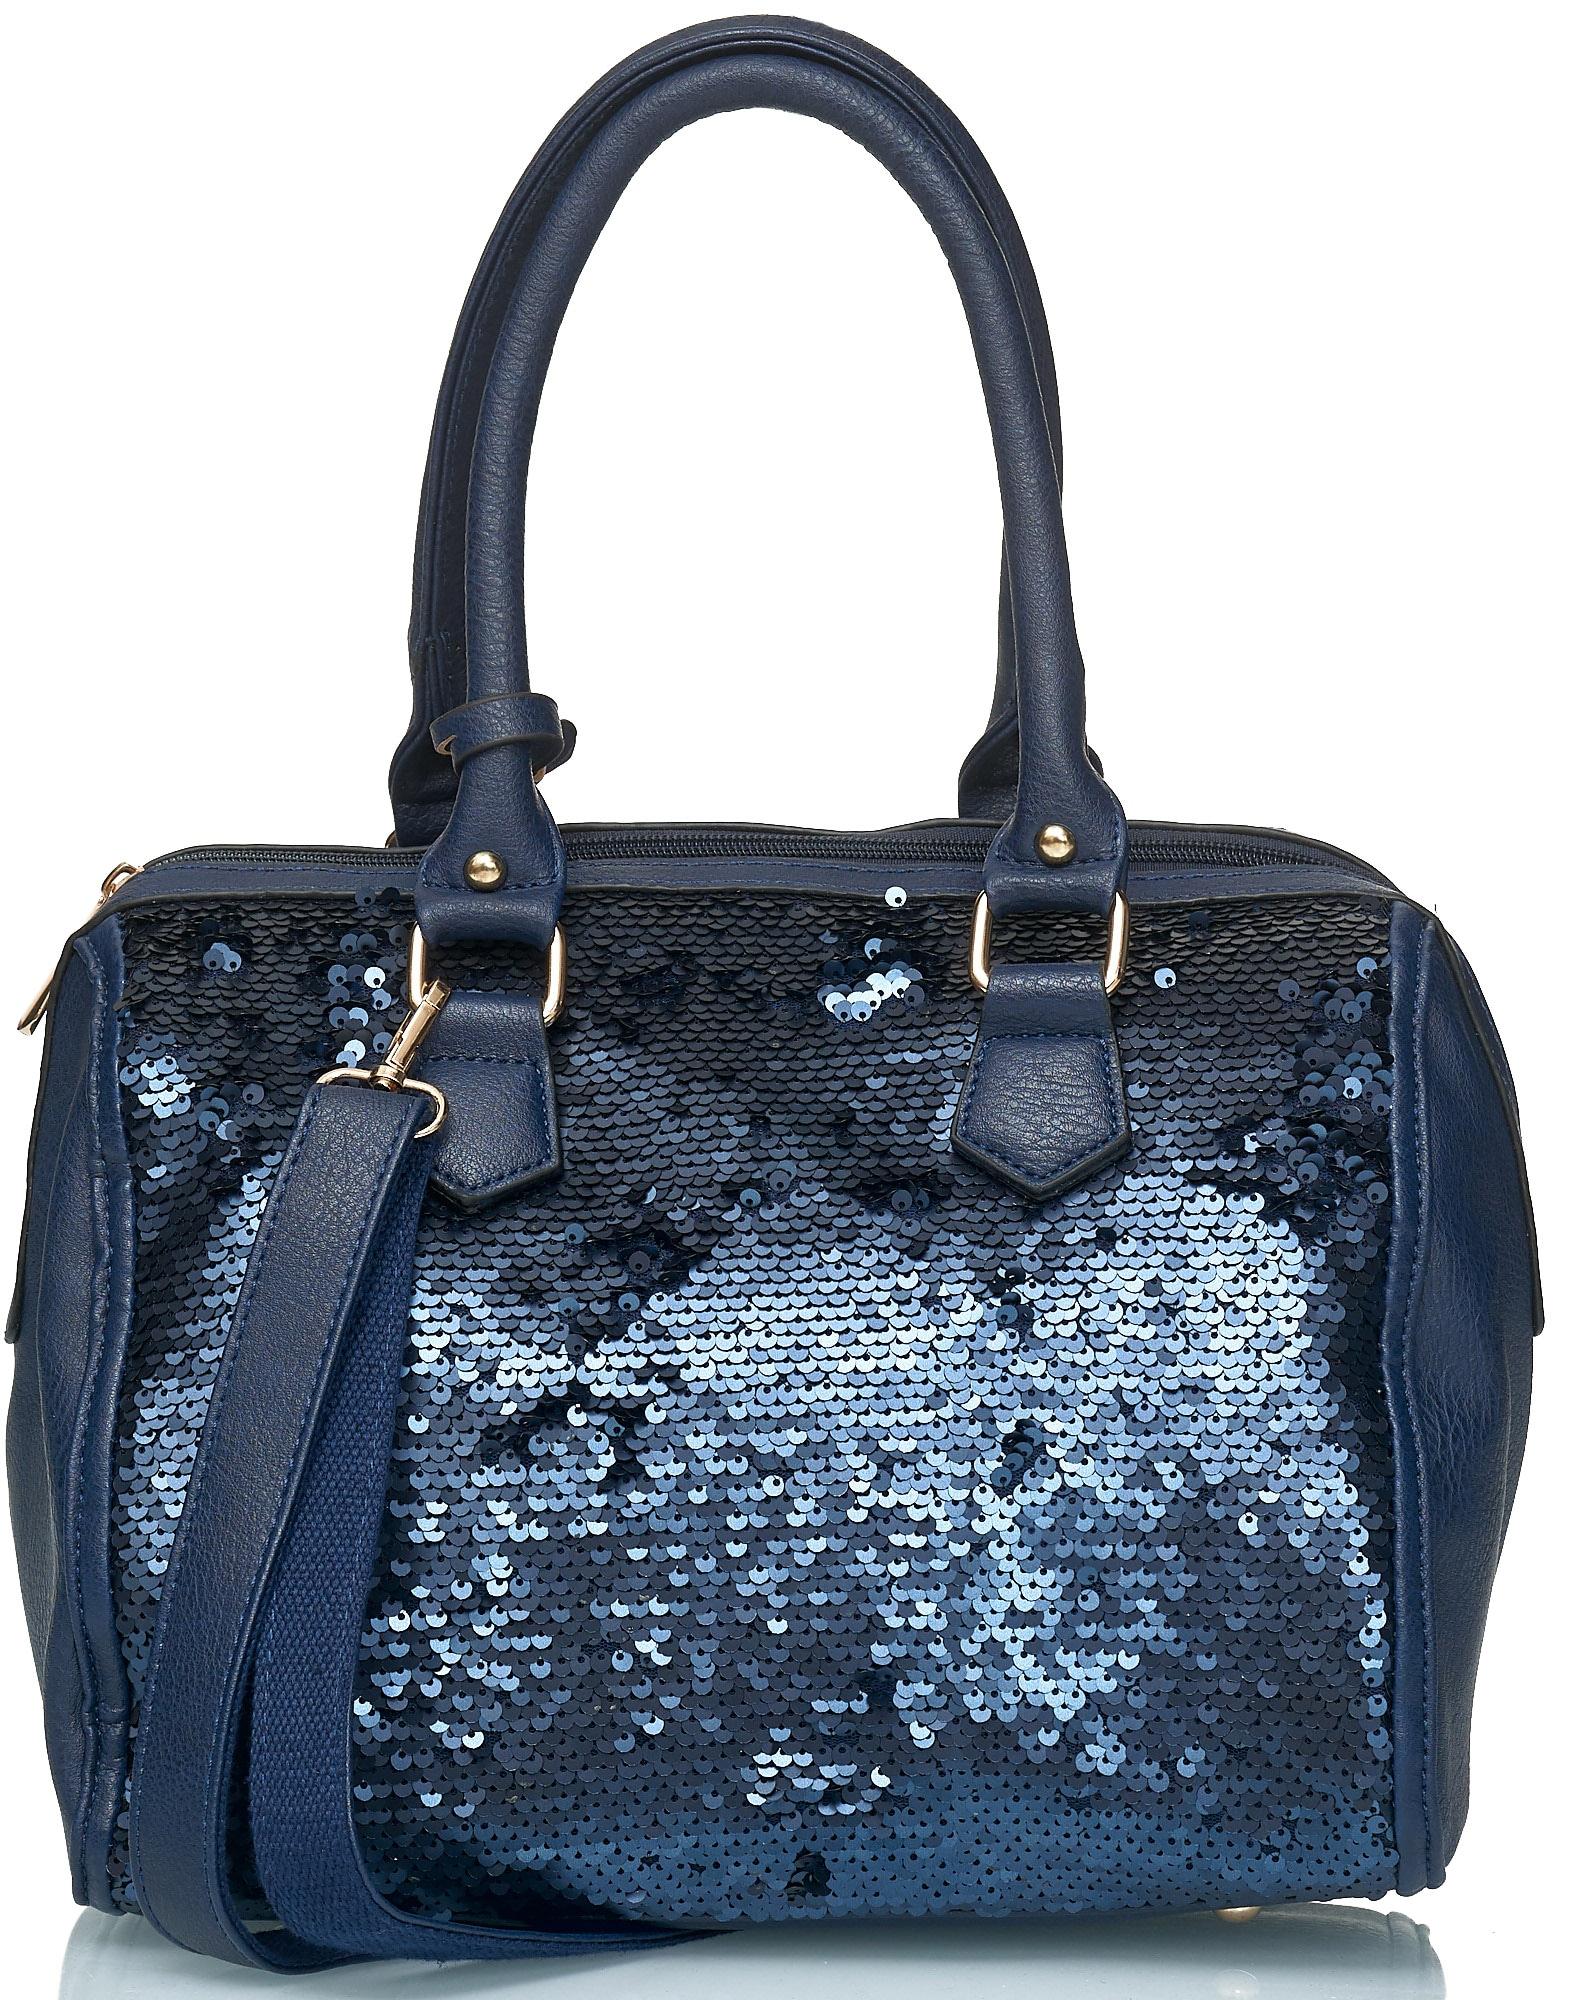 Bowlingtasche | Taschen > Handtaschen > Bowlingtaschen | Emma & Kelly